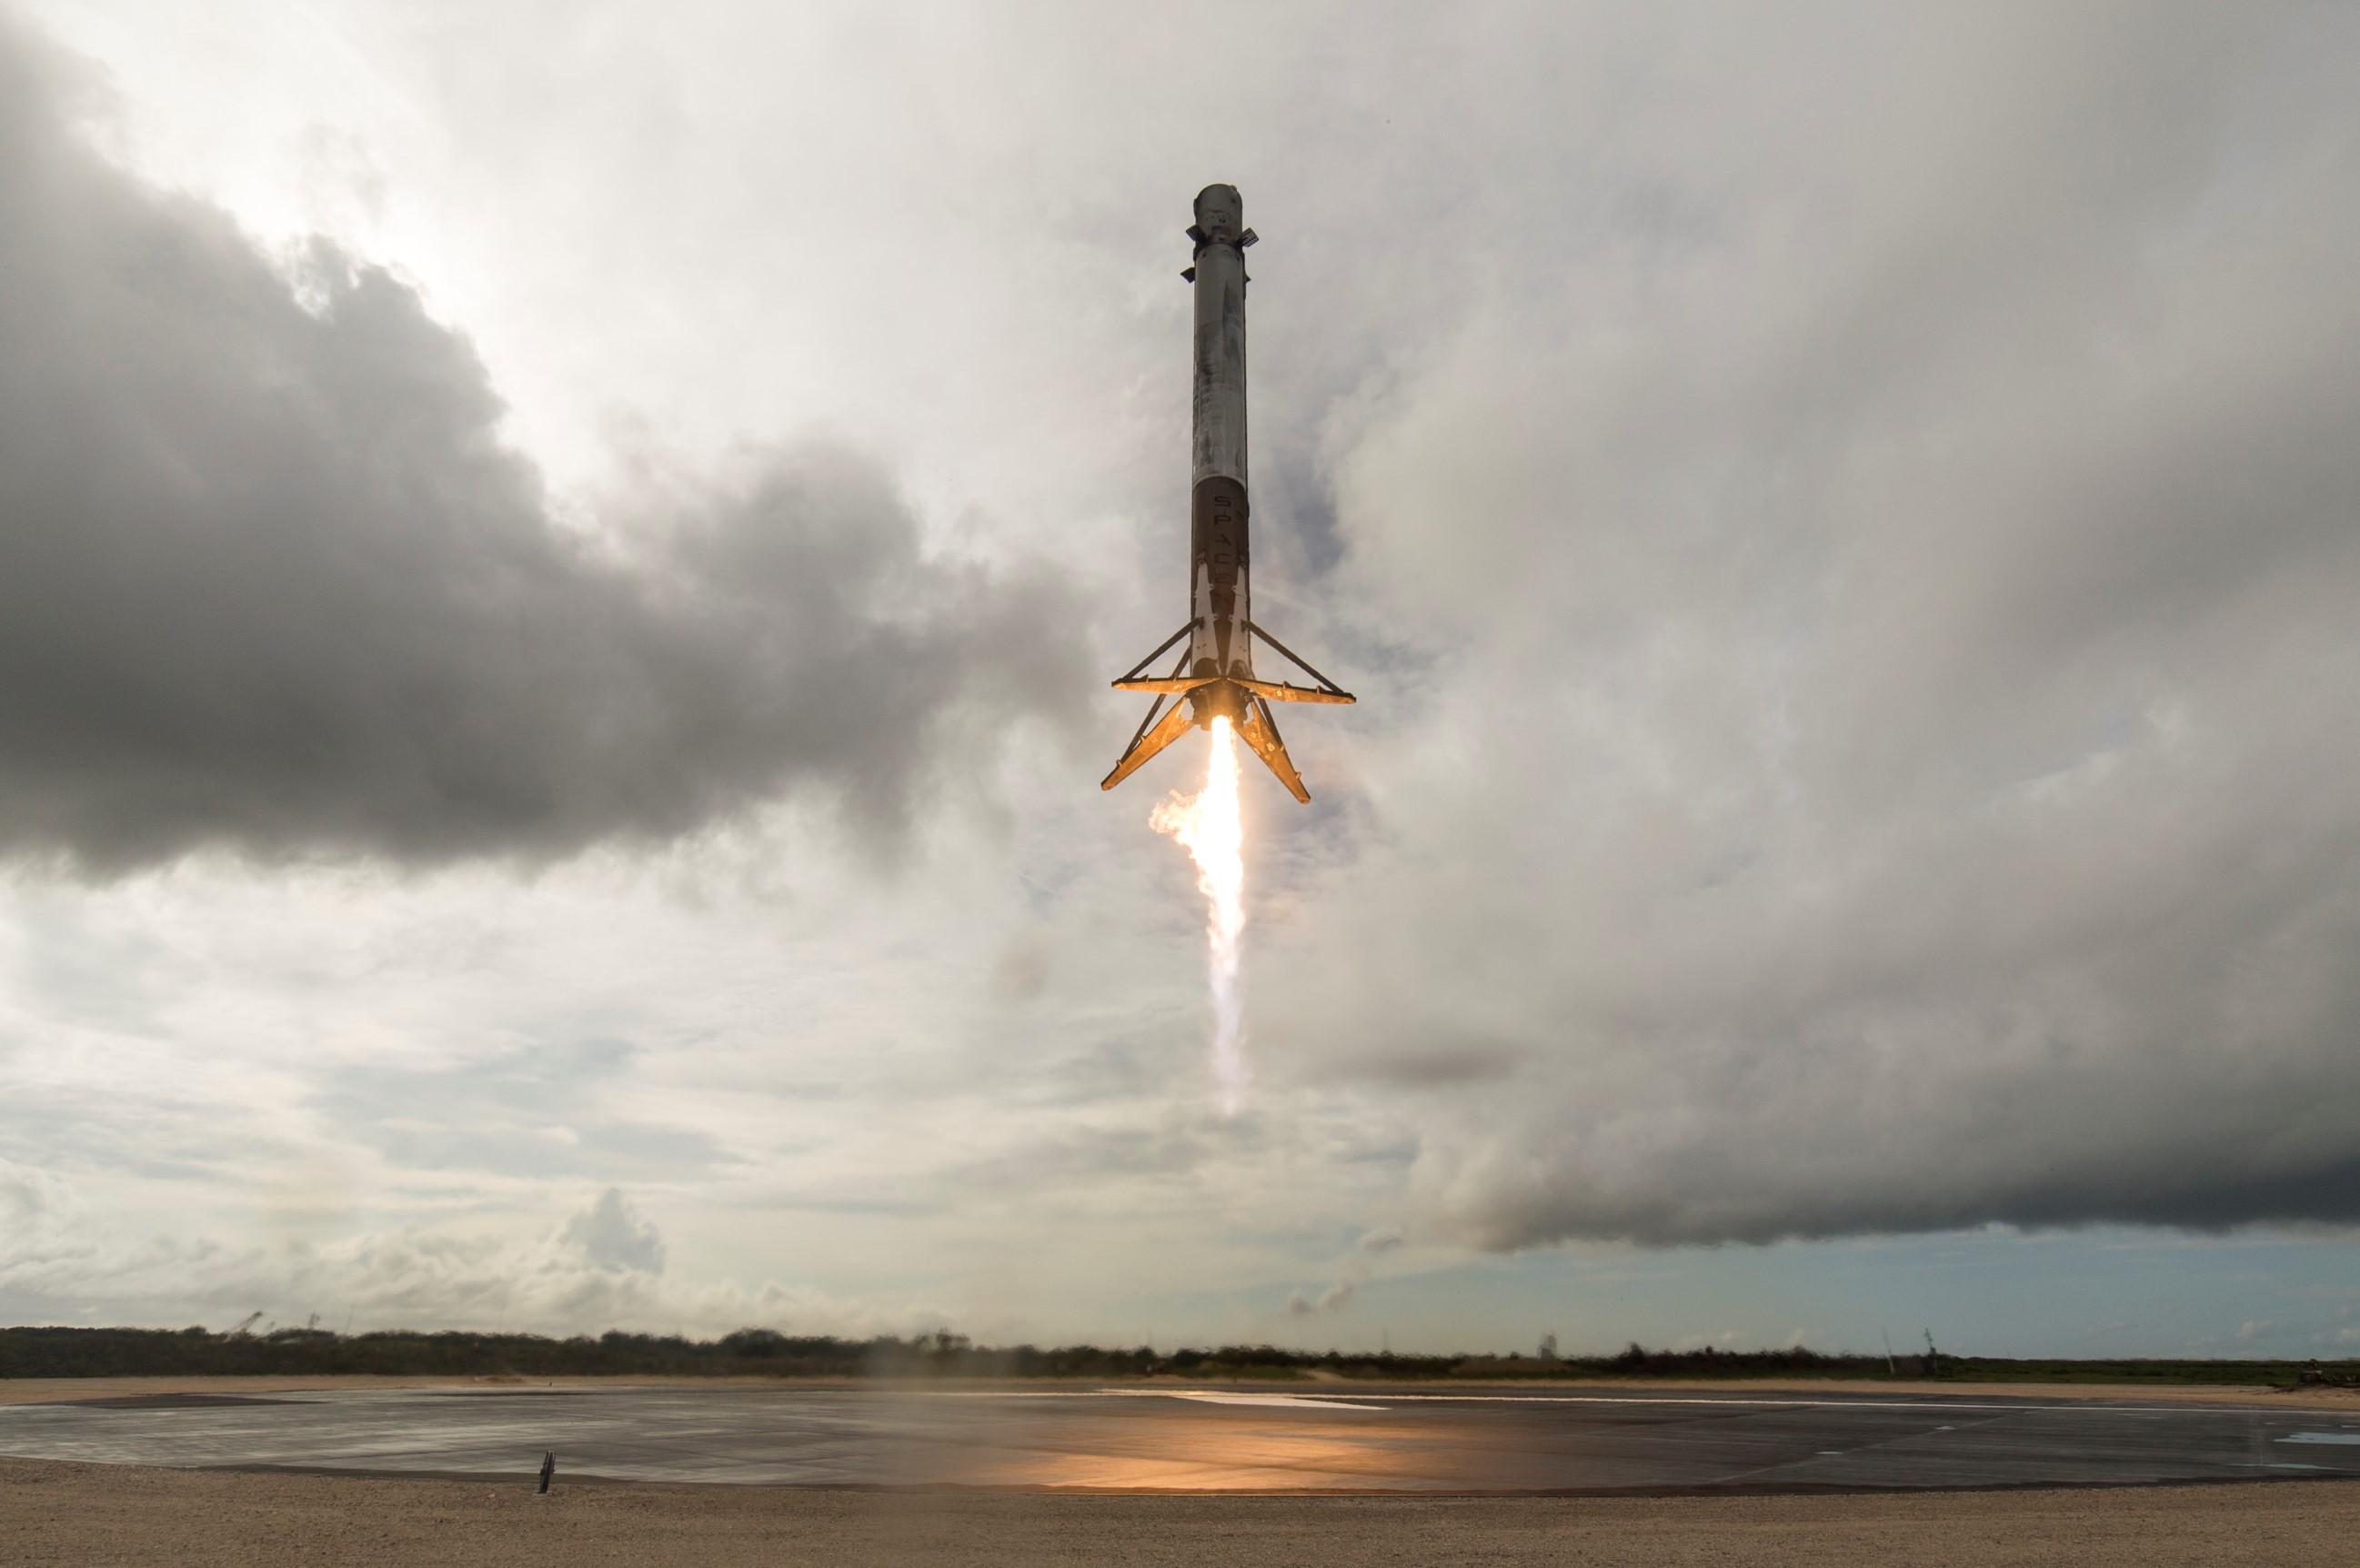 CRS-11 landing (SpaceX)